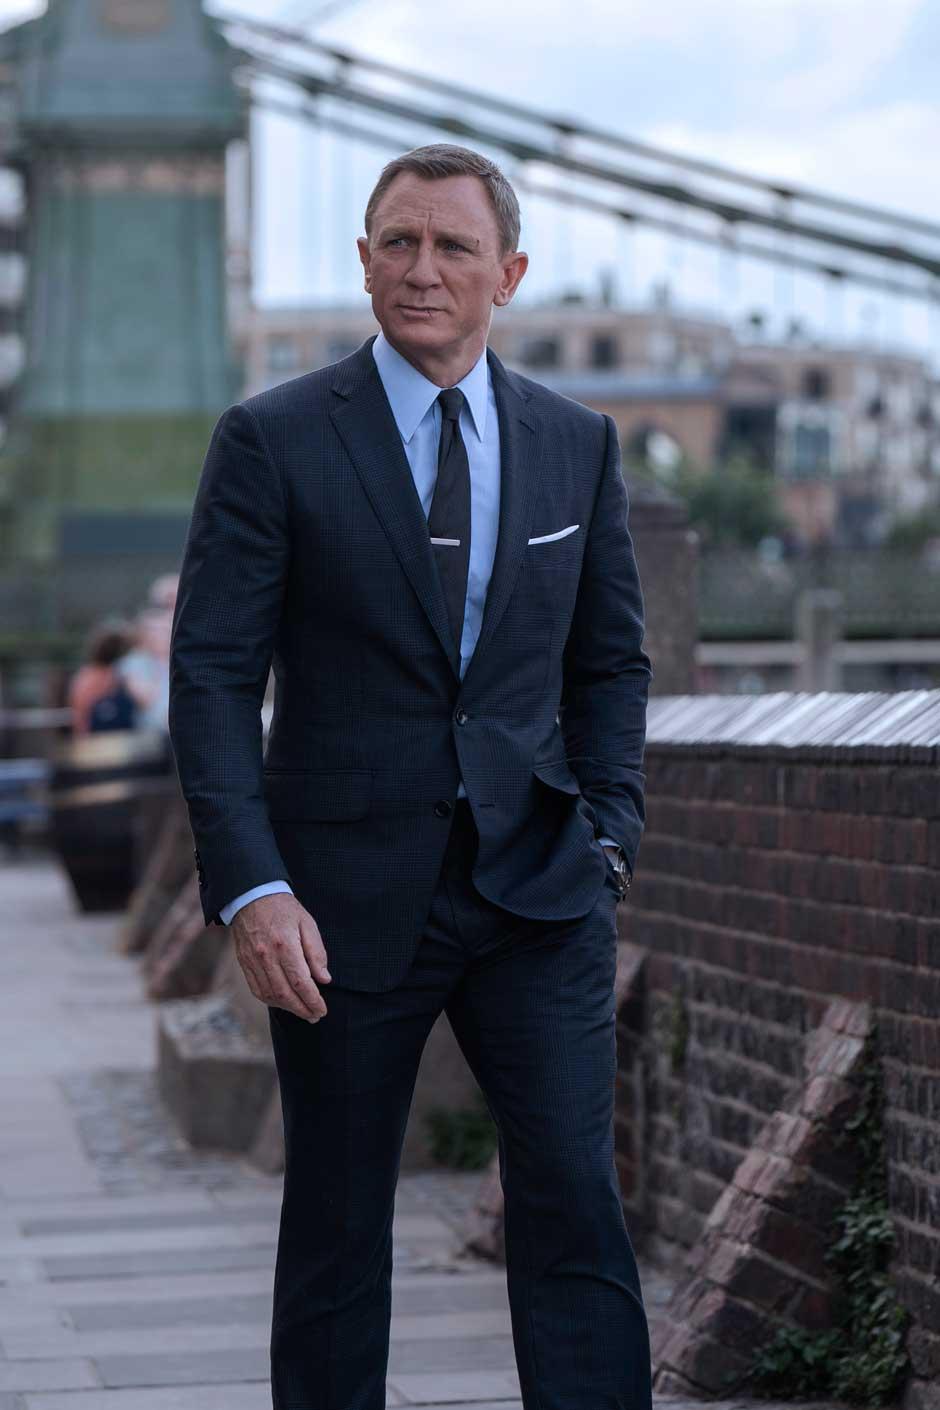 OMEGA Seamaster Diver 300M 007 Edition: el nuevo reloj de James Bond 007   Tu Gran Viaje